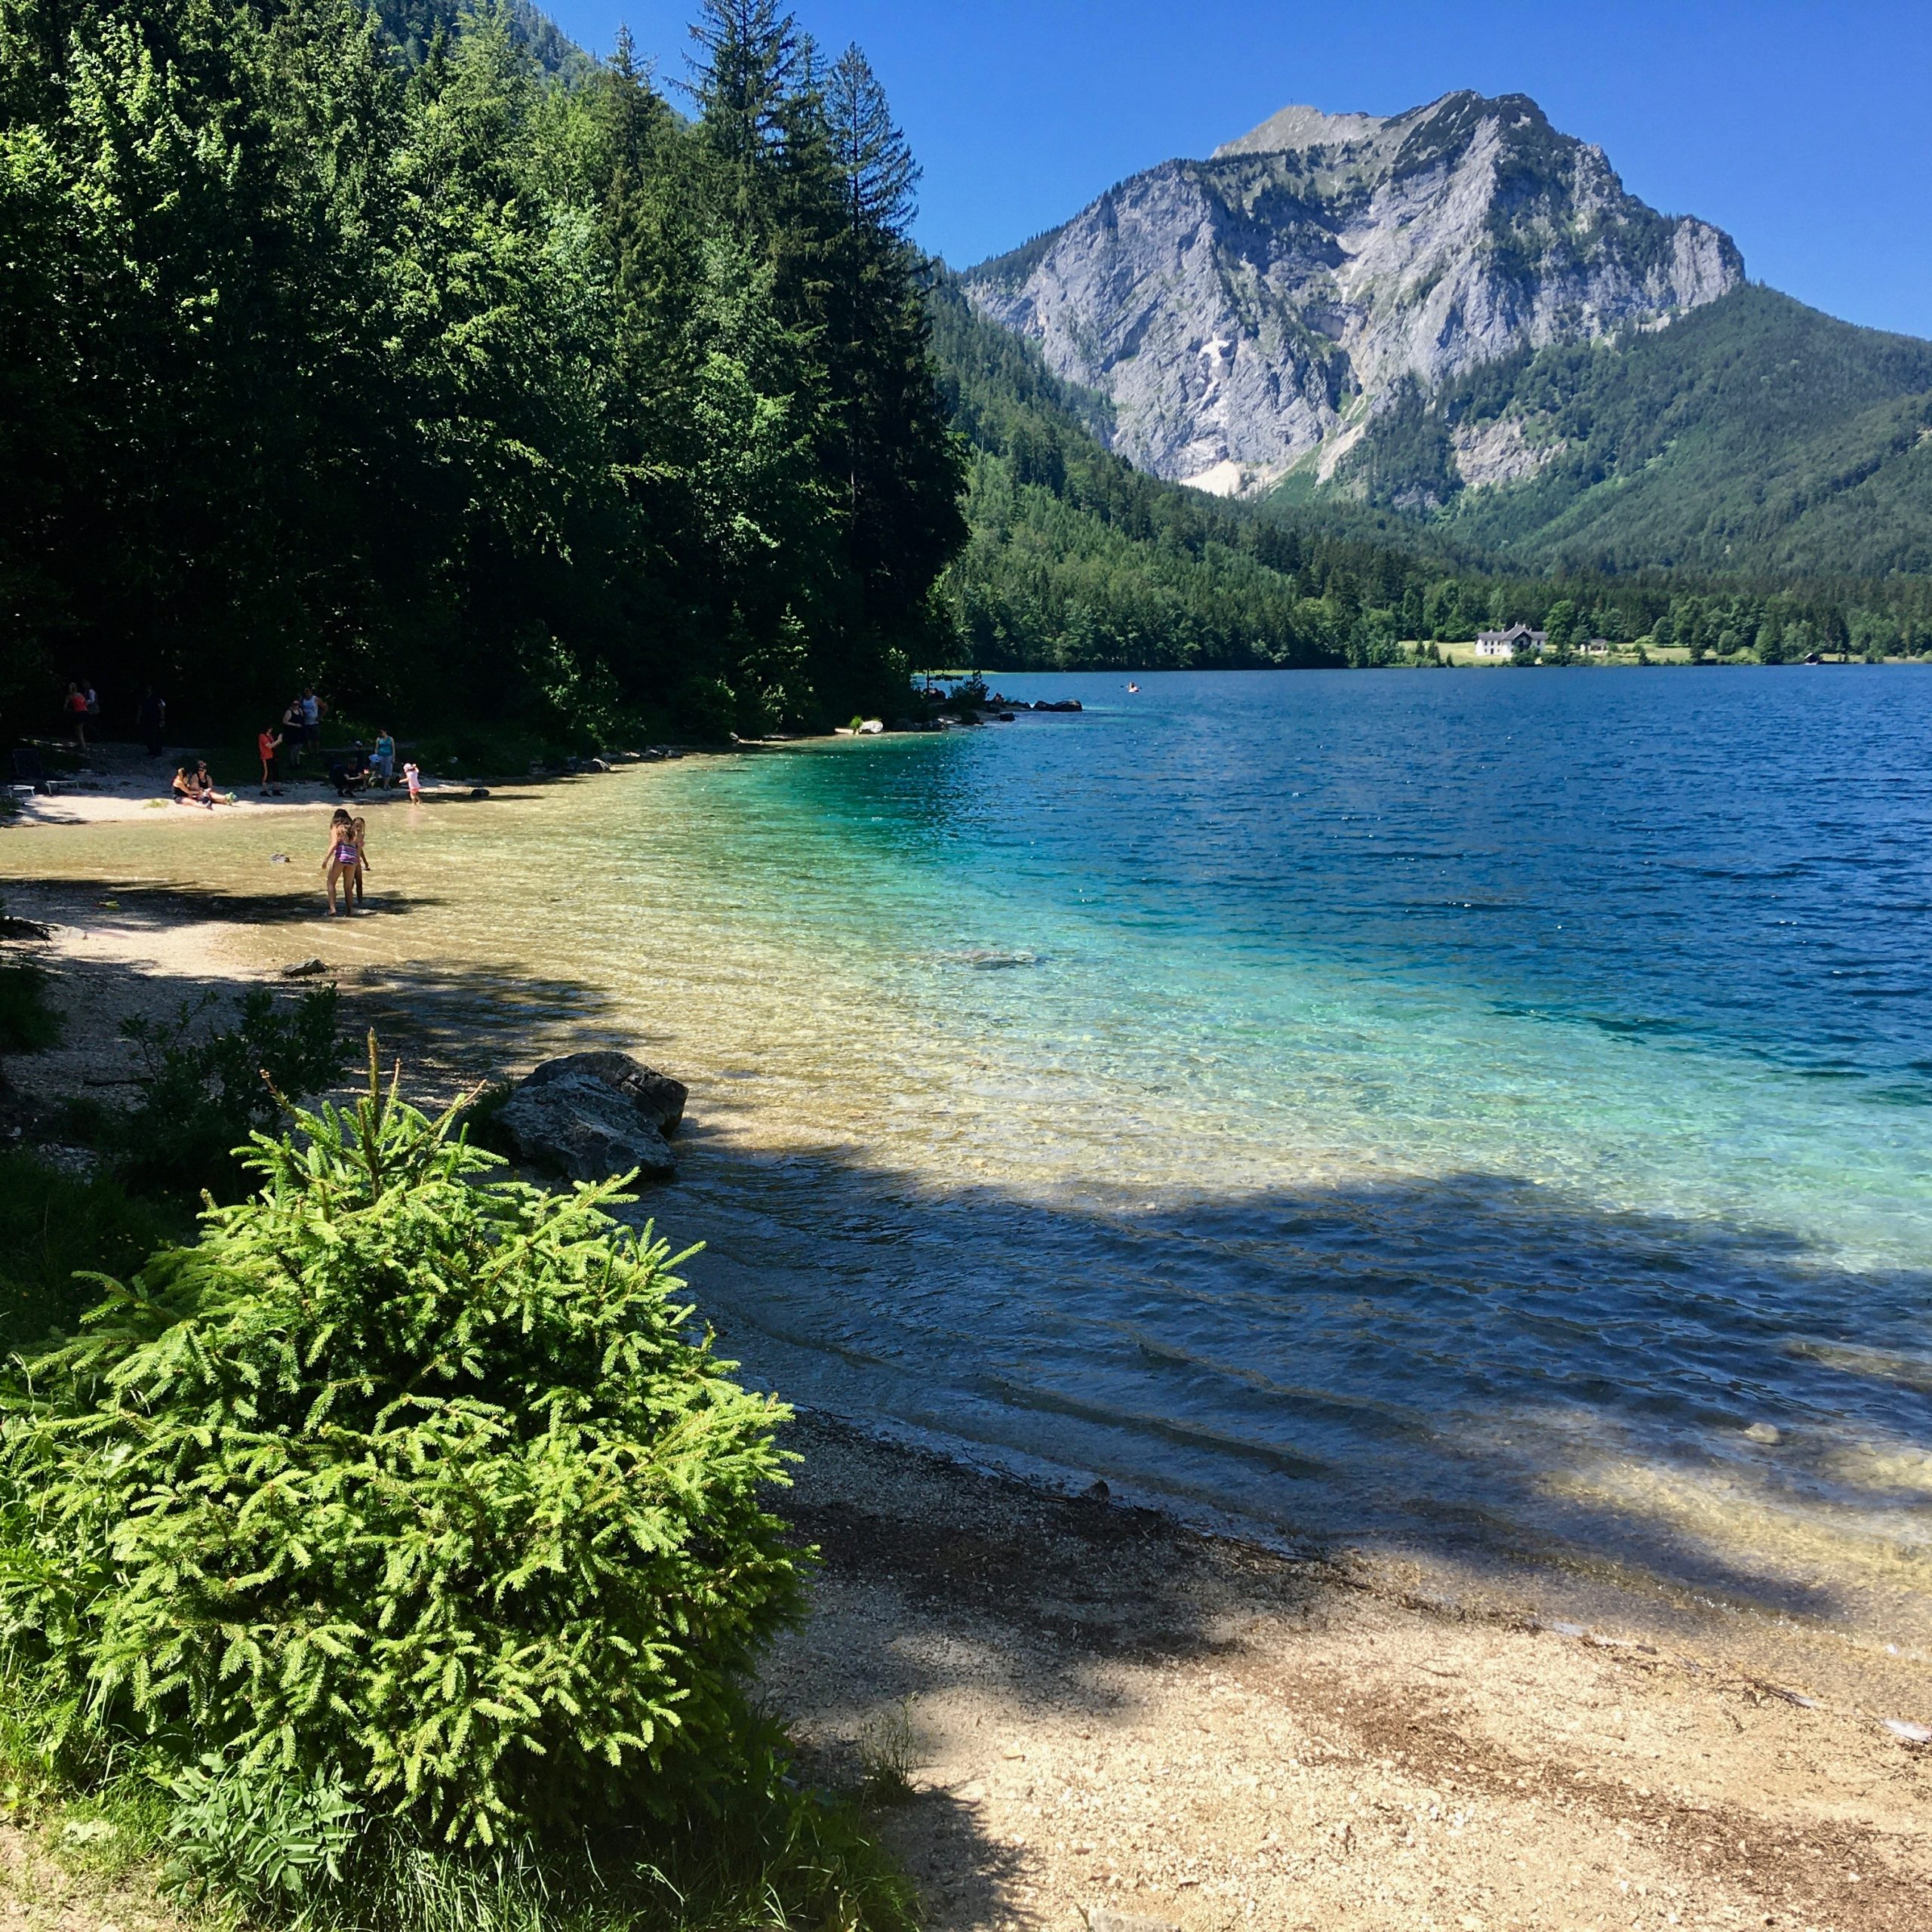 Langbathseen, Rakouská jezera